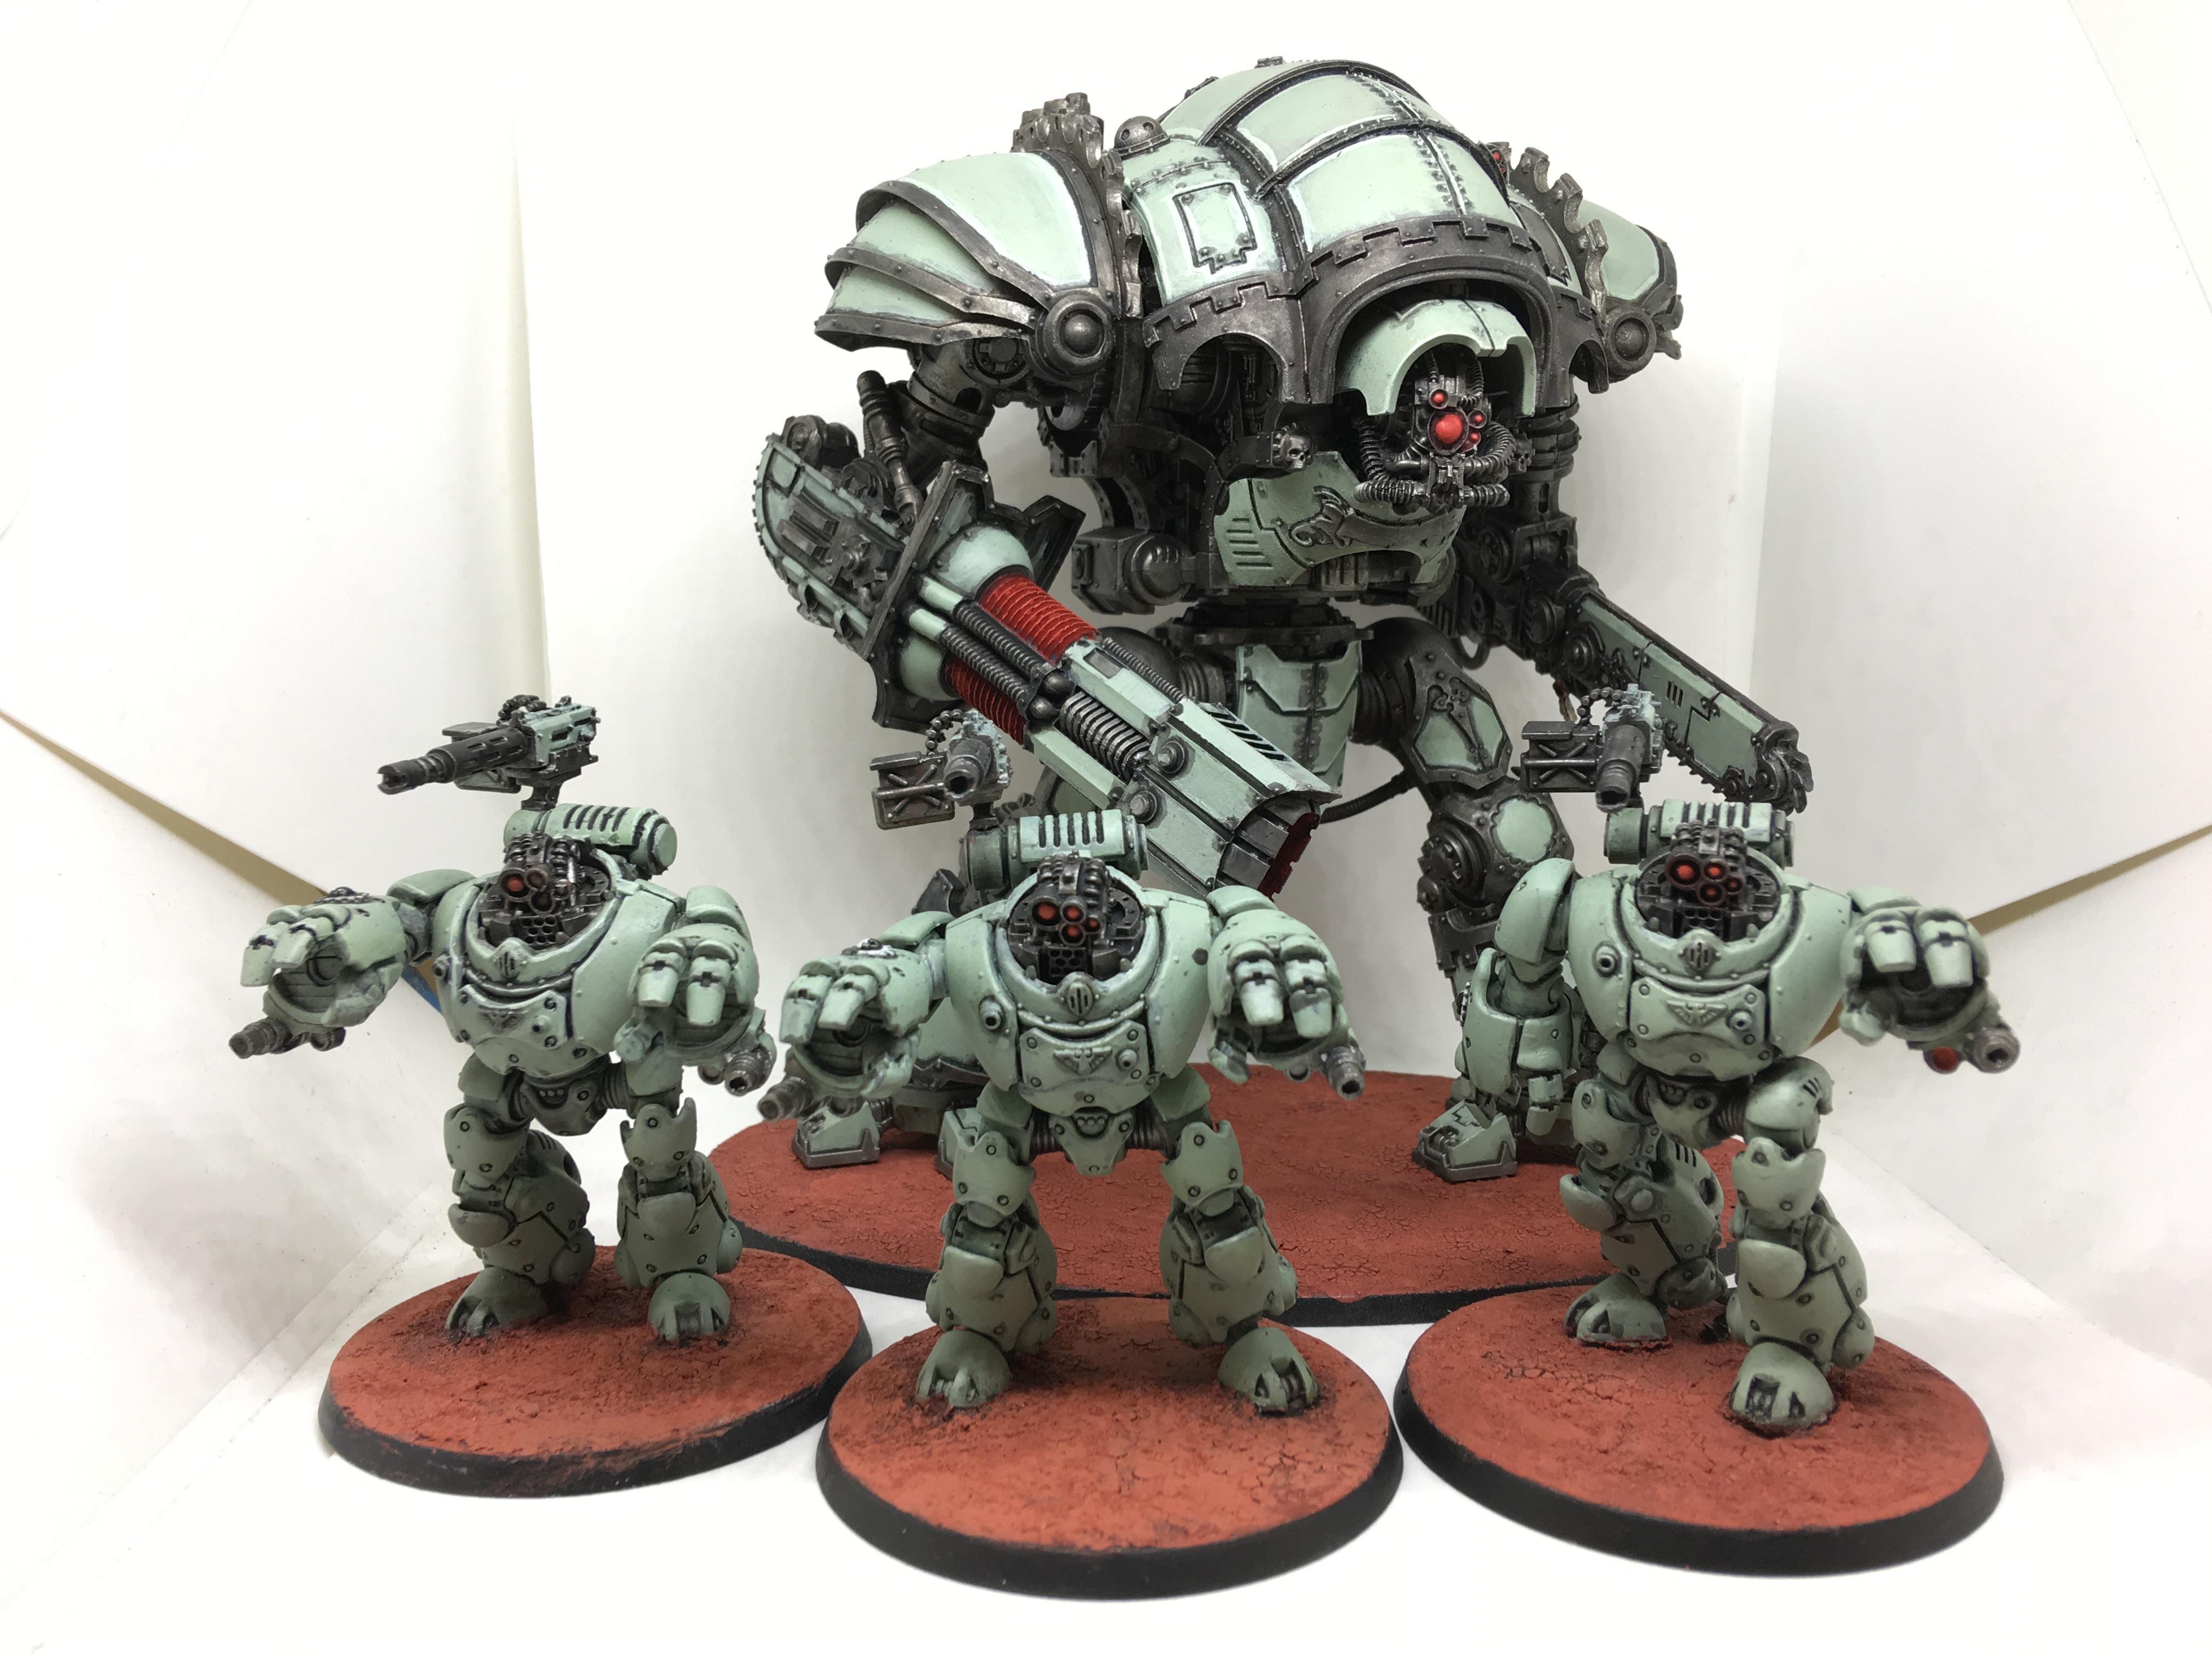 Imperial Knights, Knights, Magaera, Mechanicus, Styrix, Warhammer 40,000